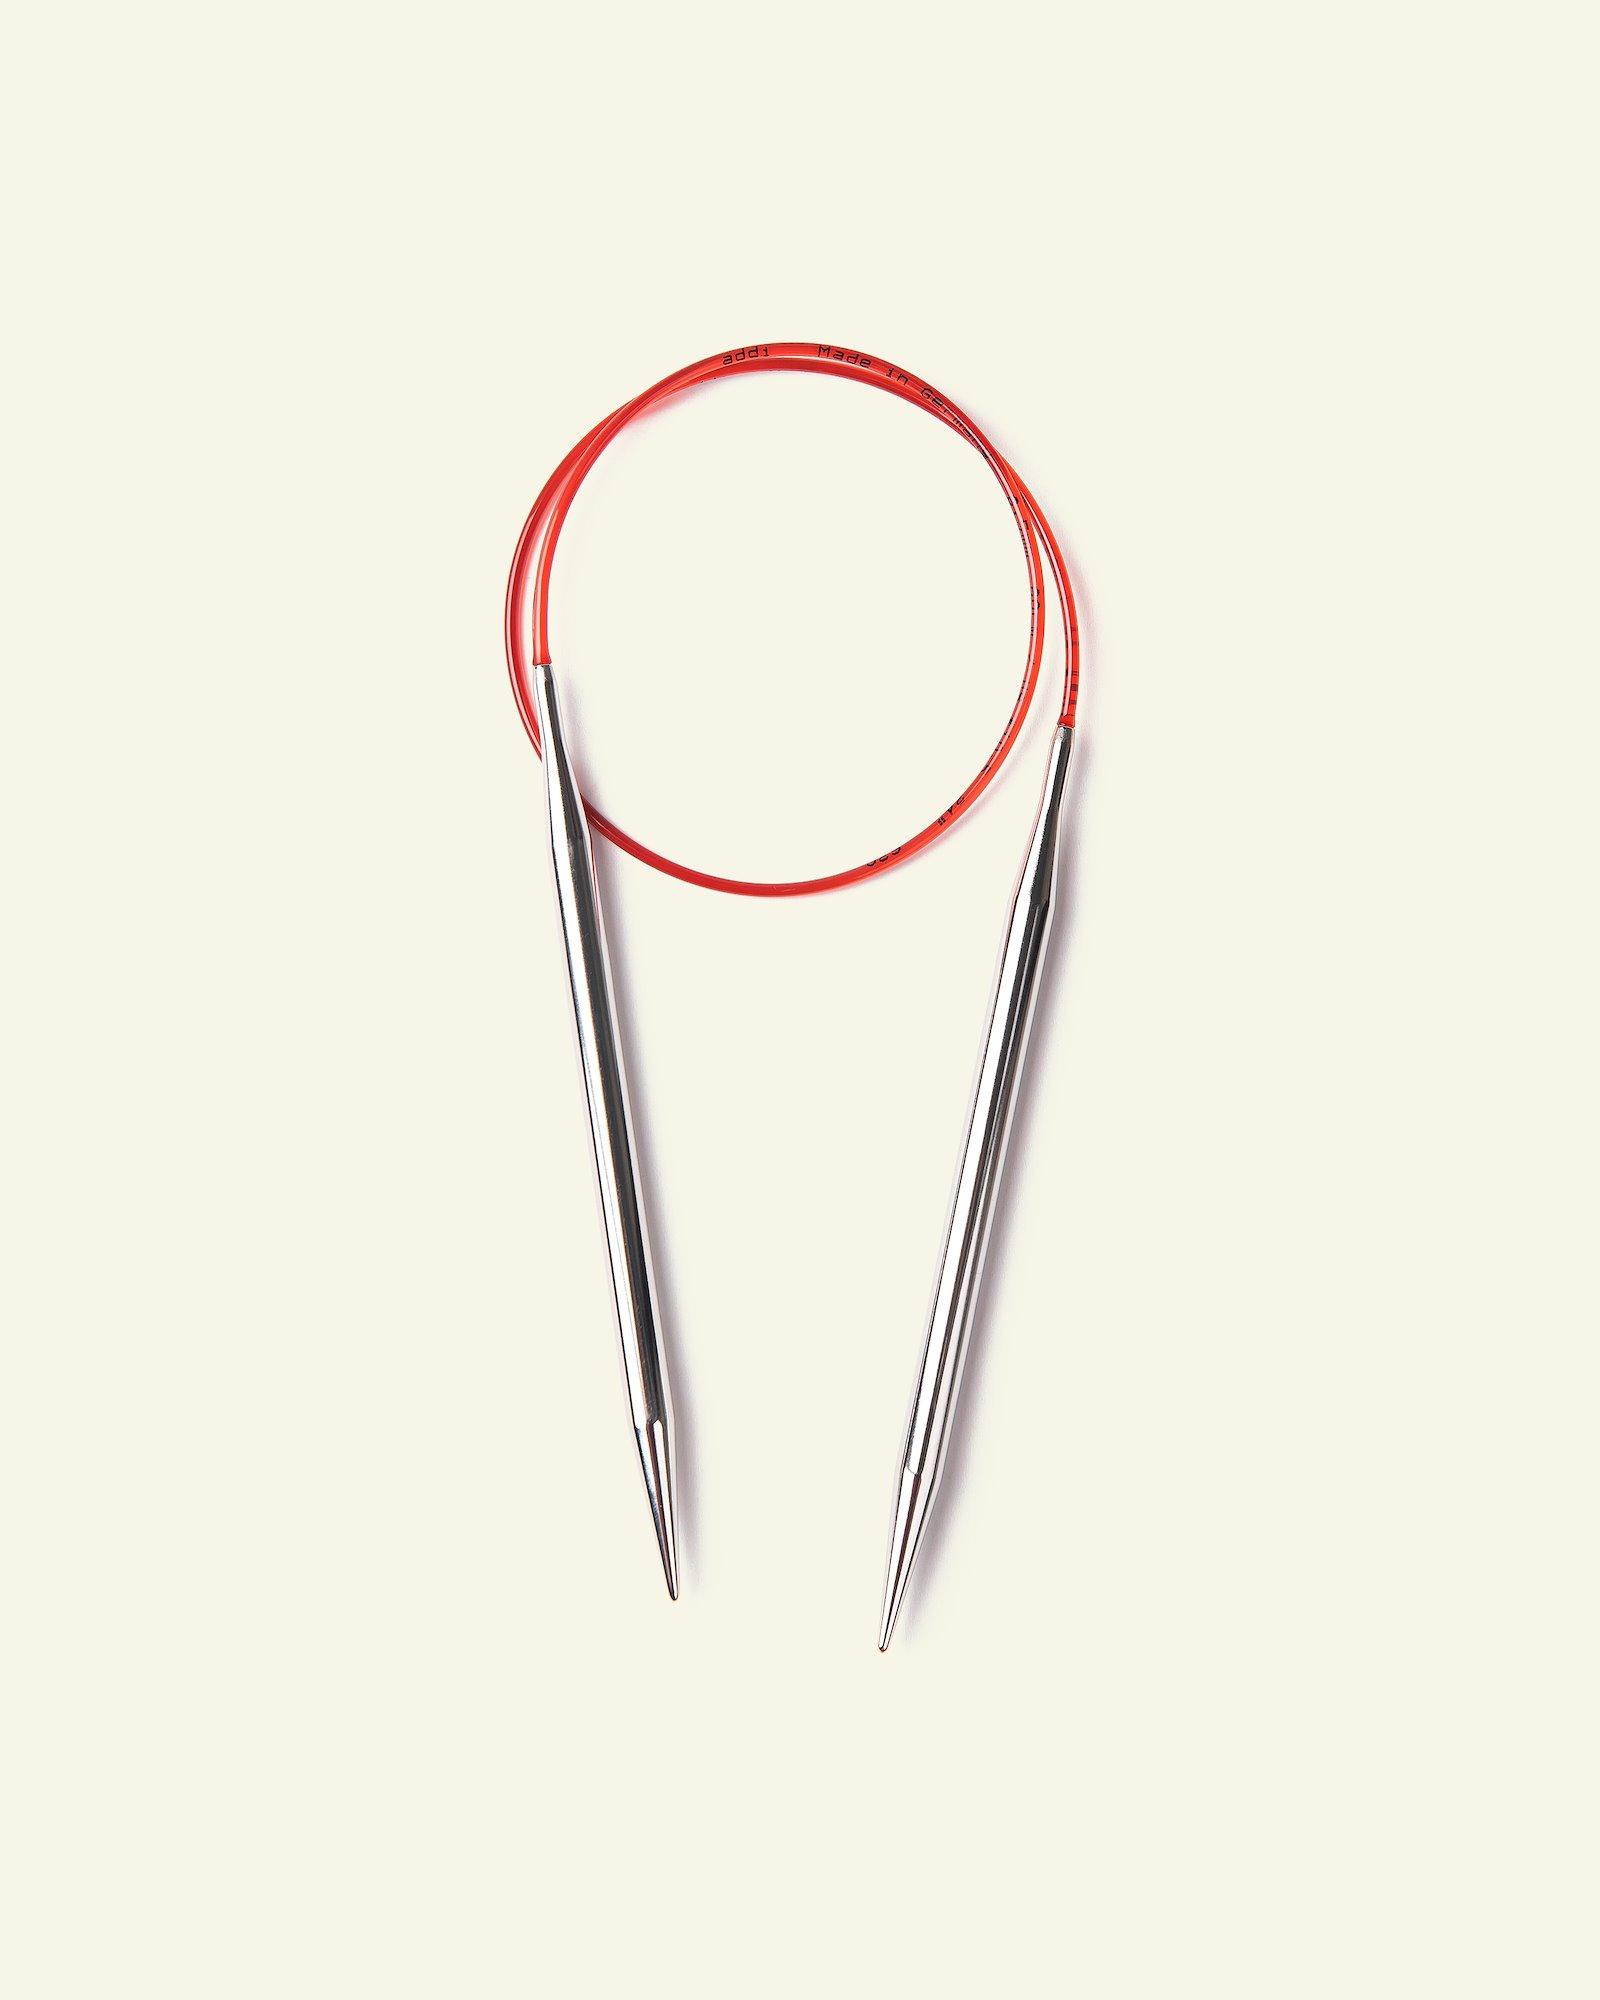 Addi Lace circular needle 60cm 7mm